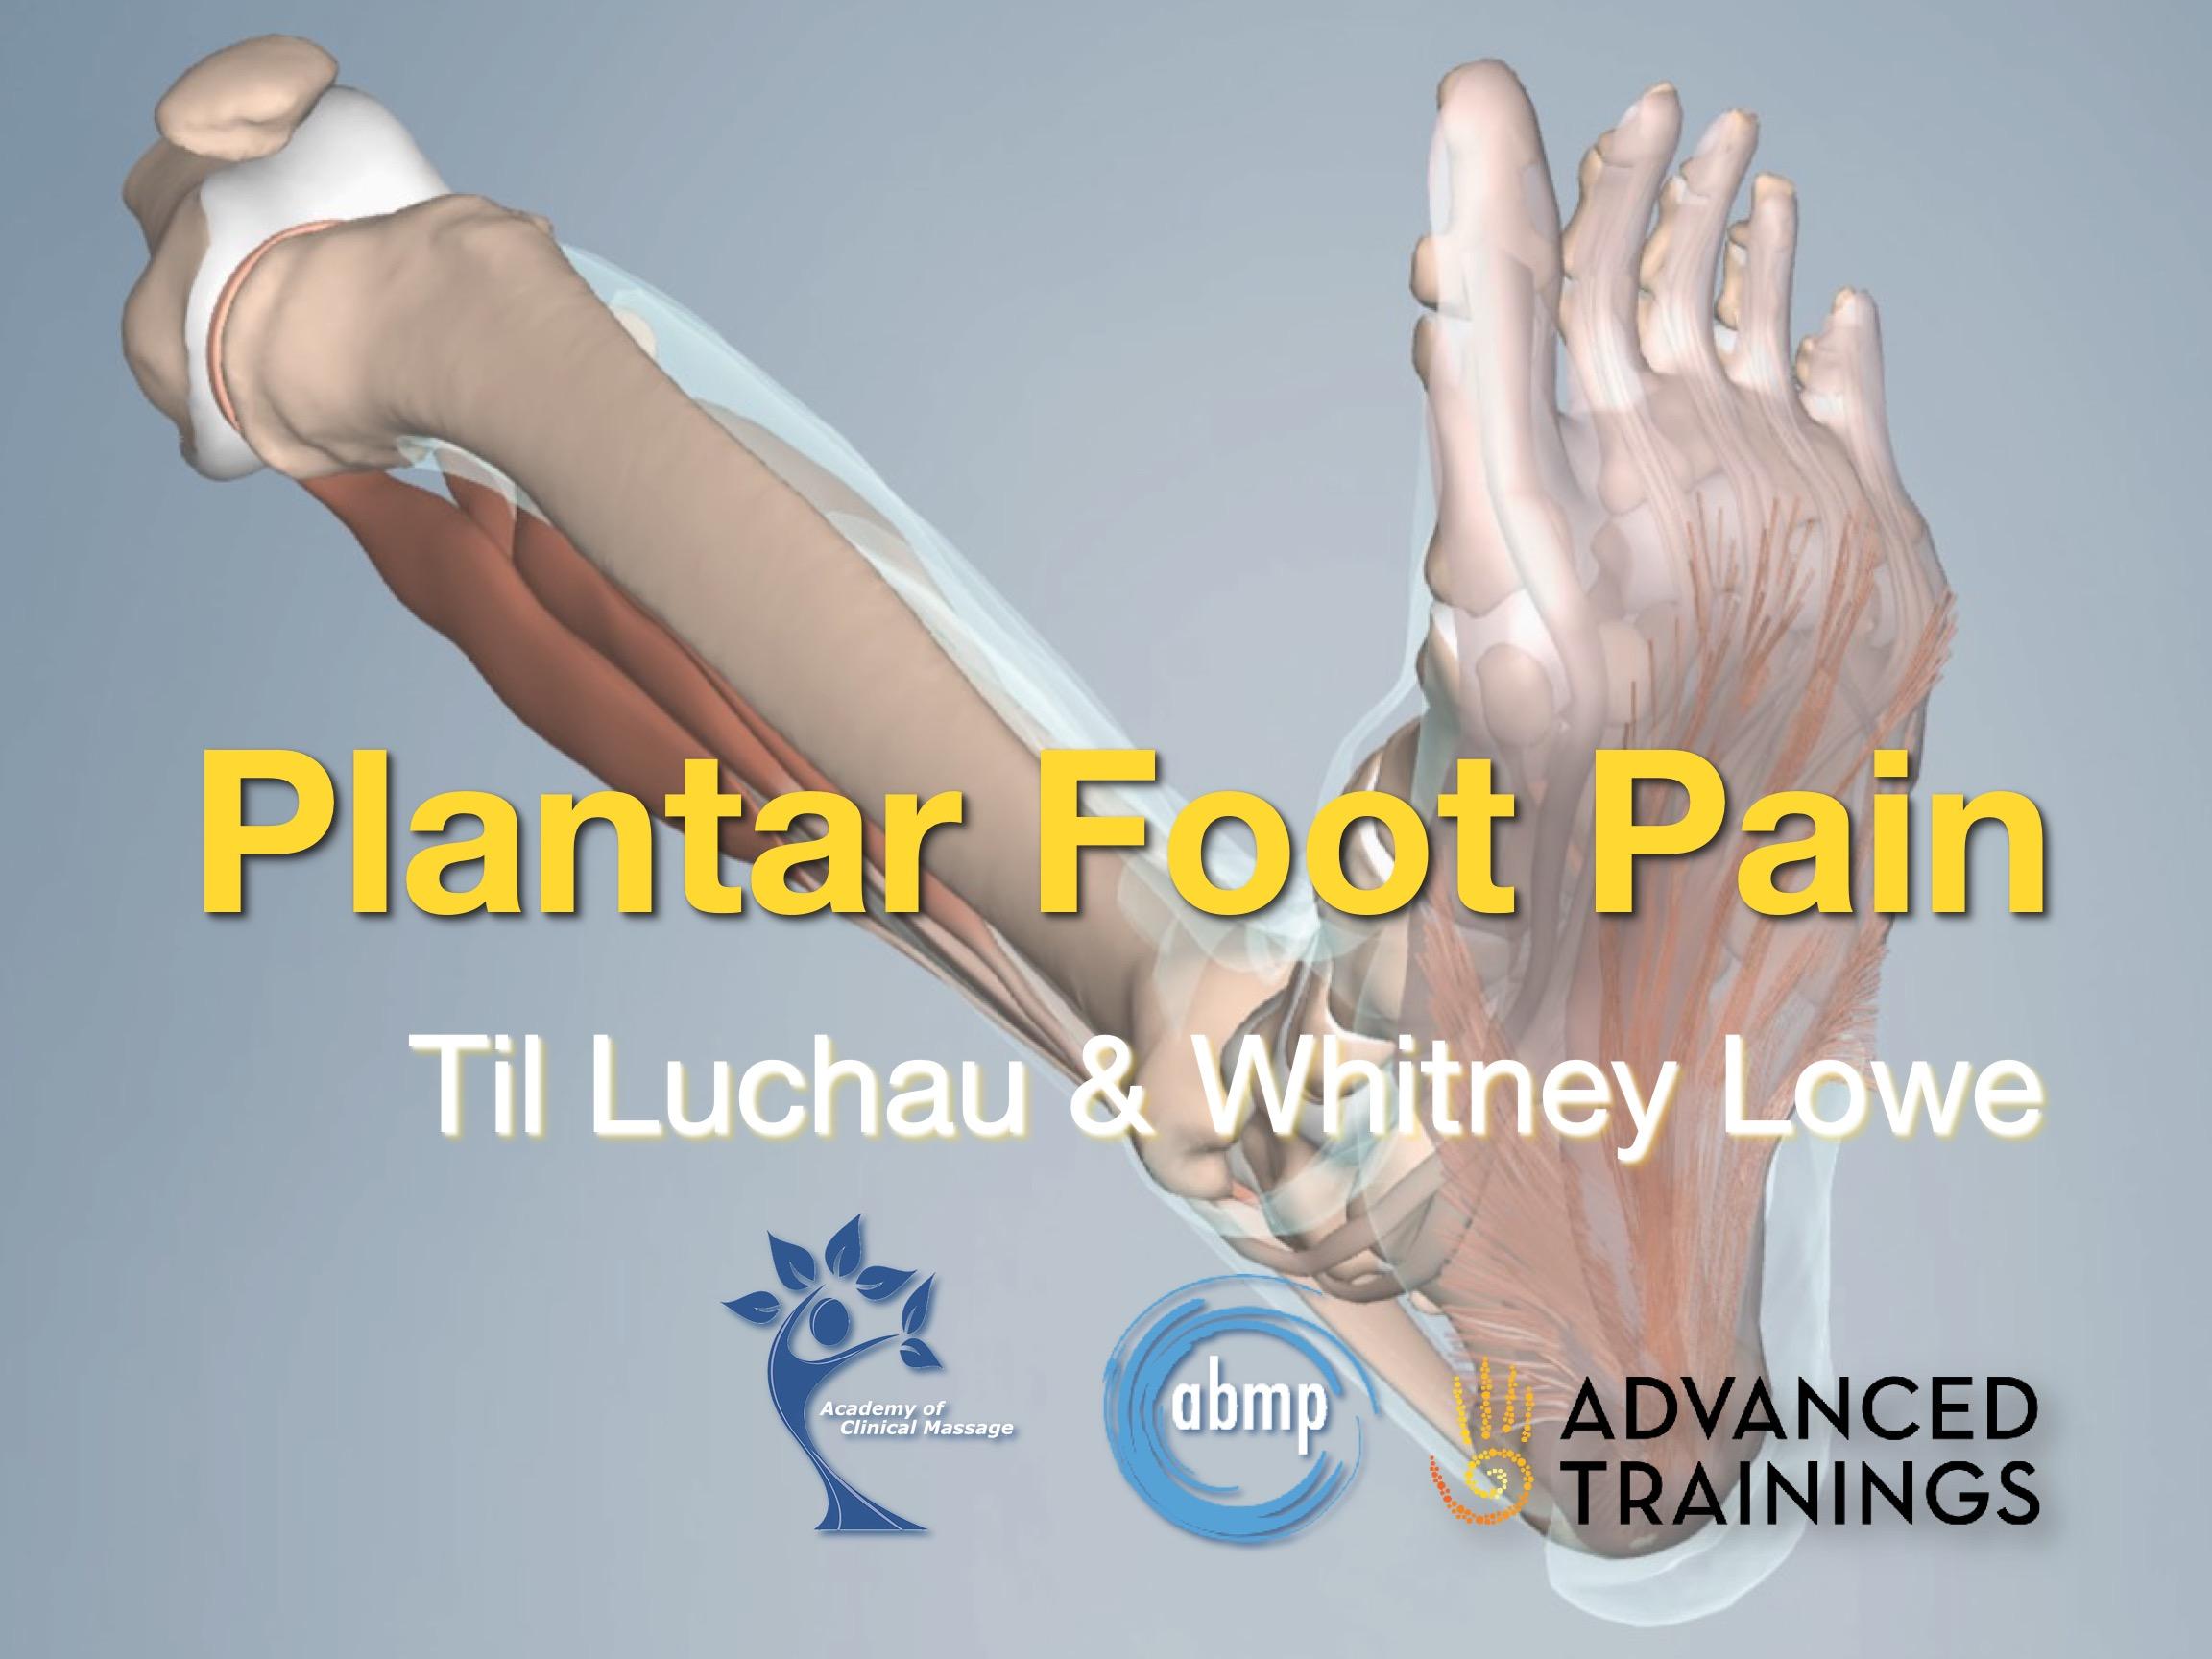 Plantar Foot Pain 1hr Online Course